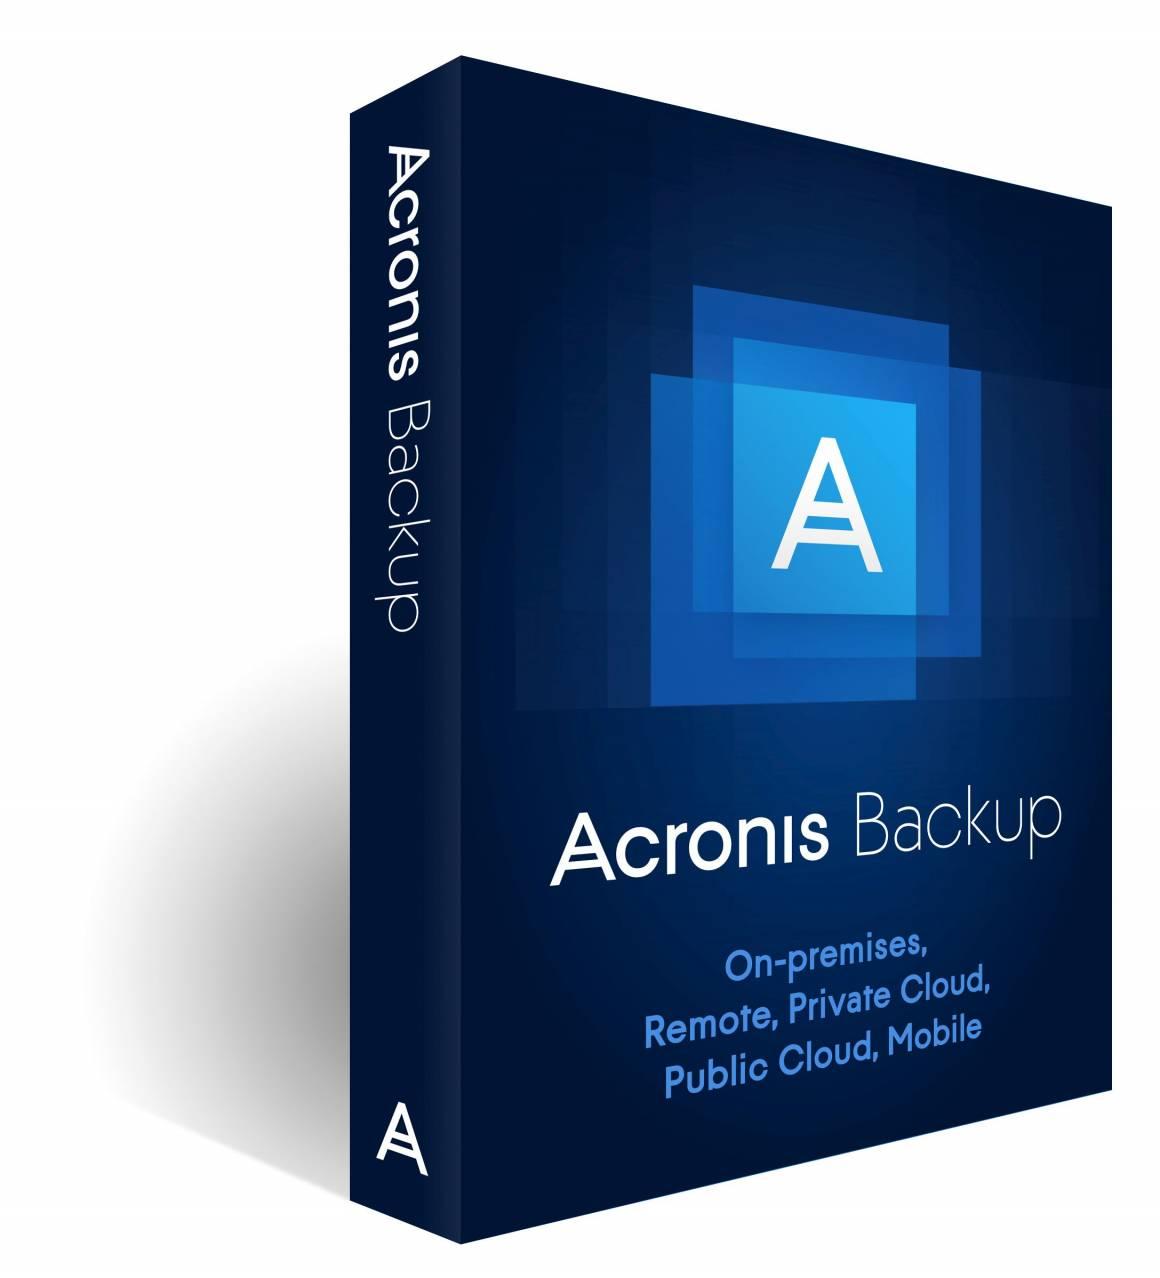 BP Acronis Backup 12 EN US right RGB 300dpi 160620 1160x1278 - Acronis svela l'innovativa soluzione Acronis Backup 12